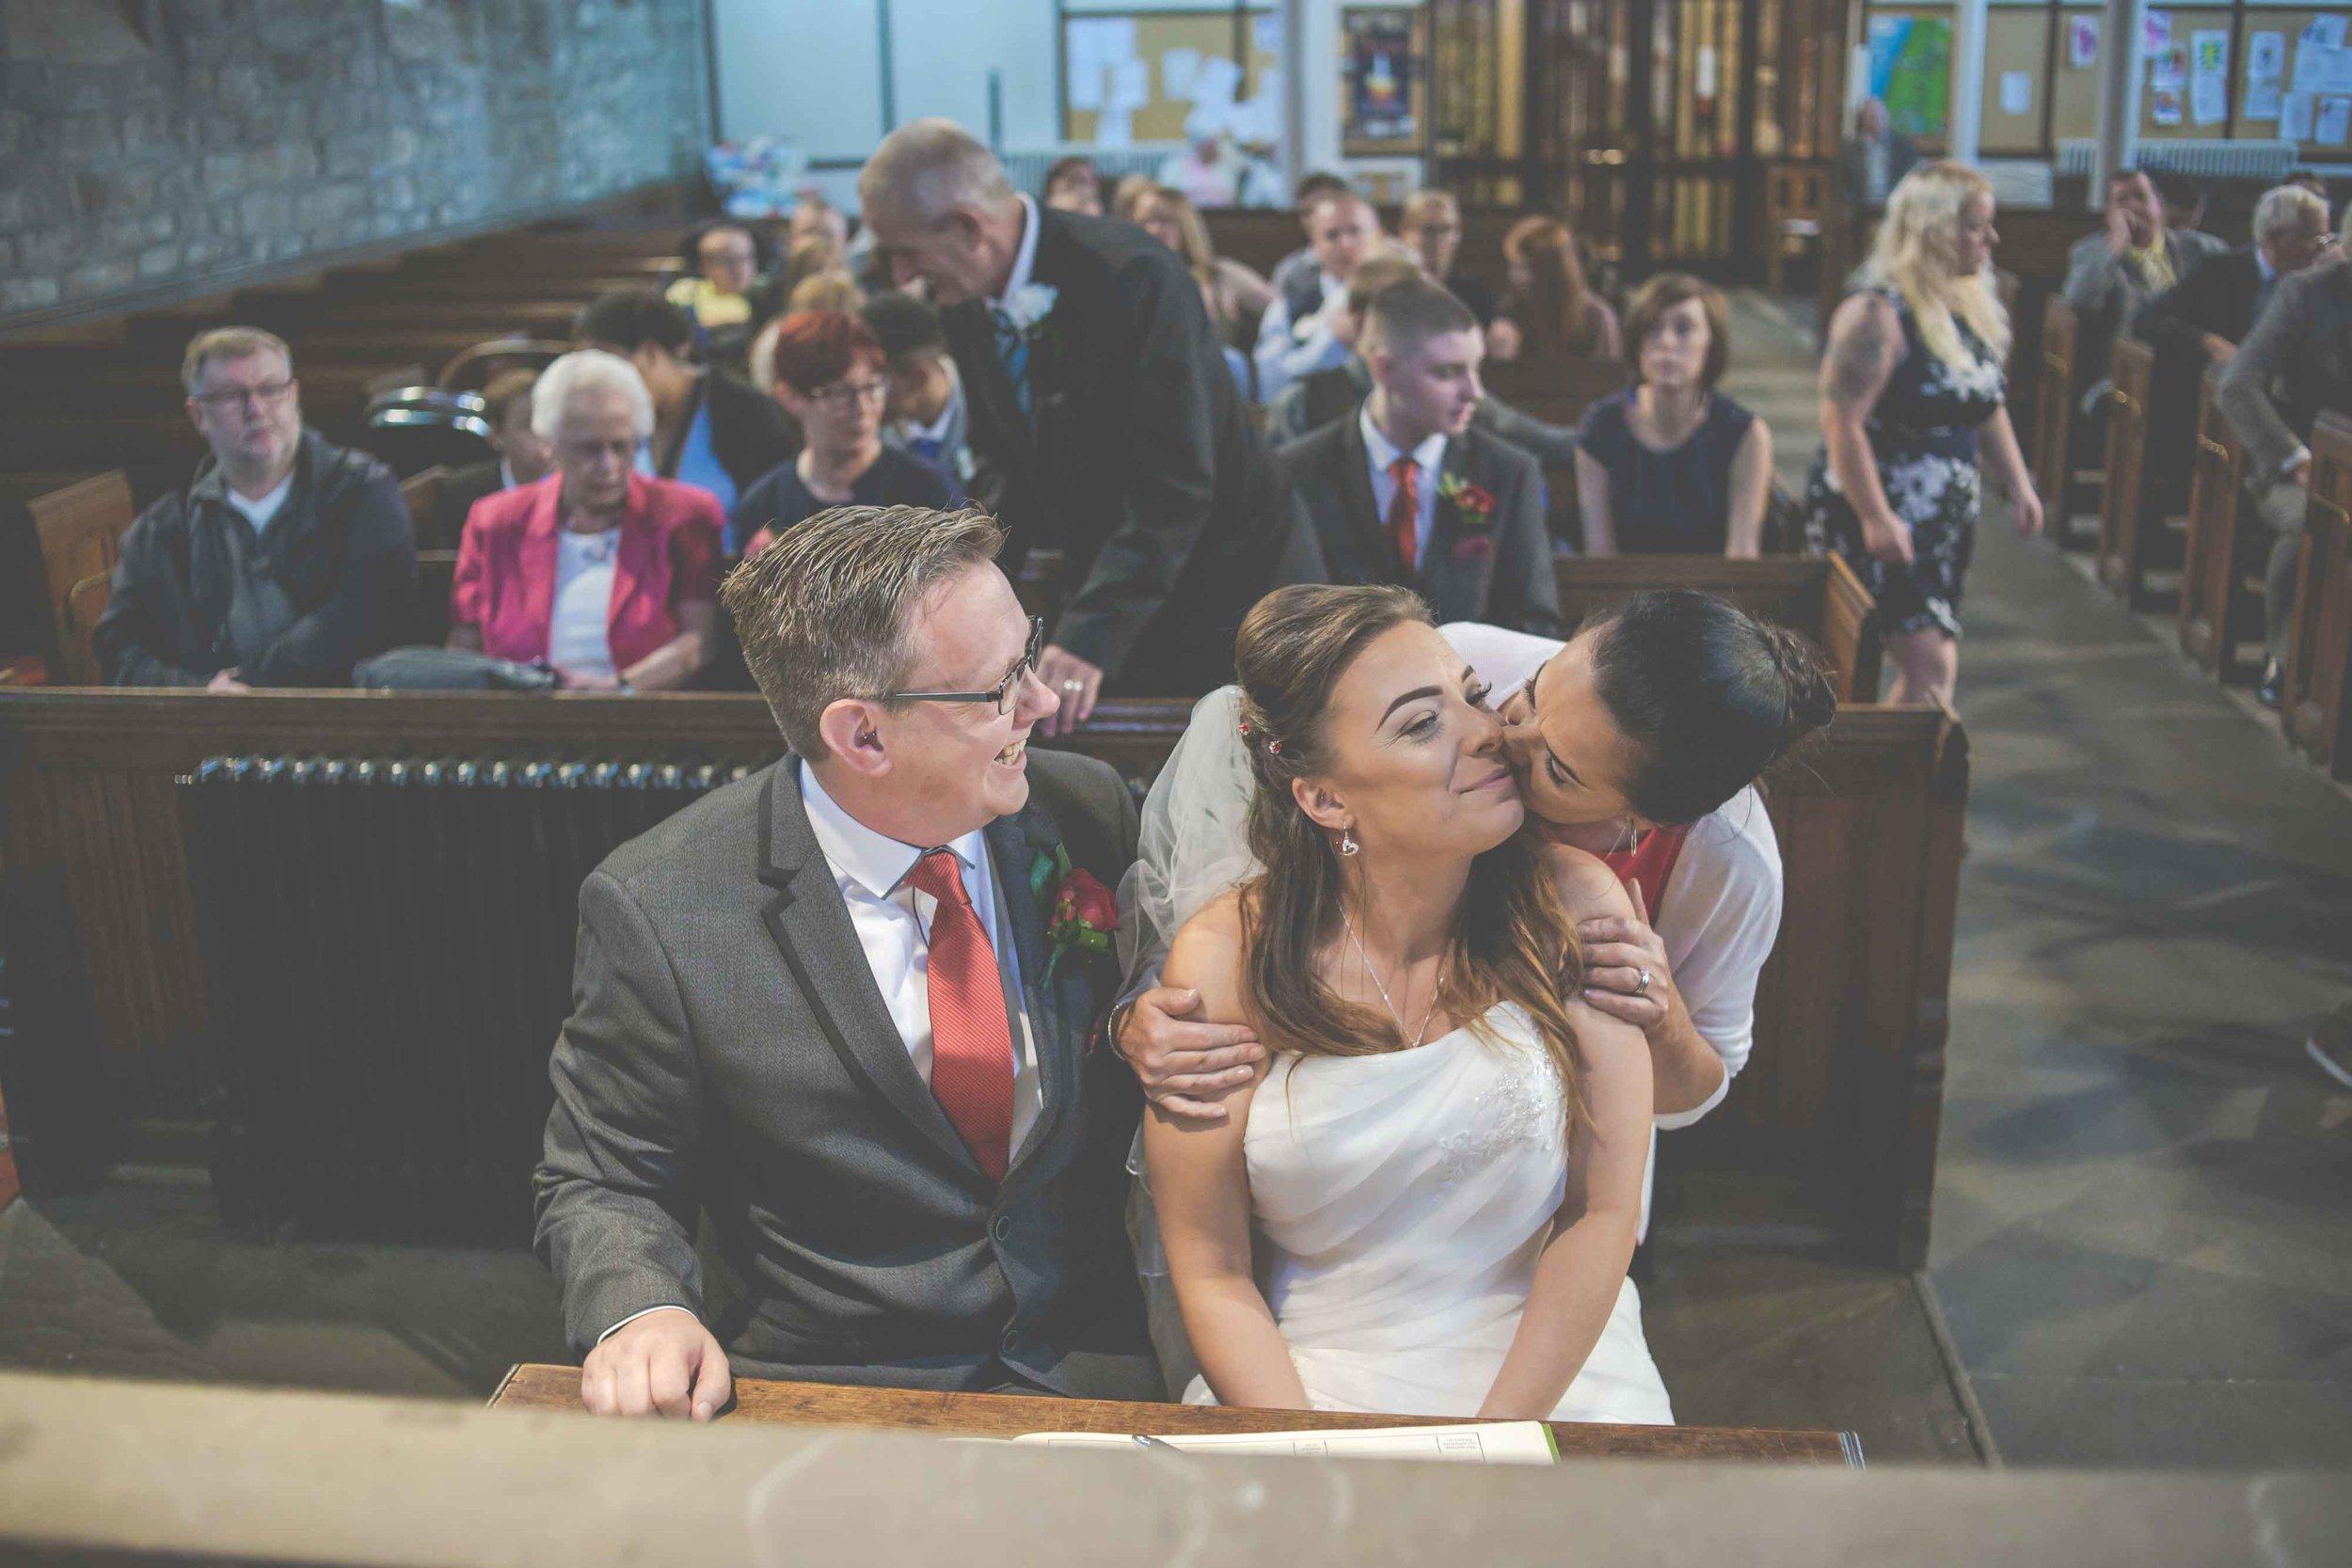 st-johns-ingrow-keighley-wedding-photos-17